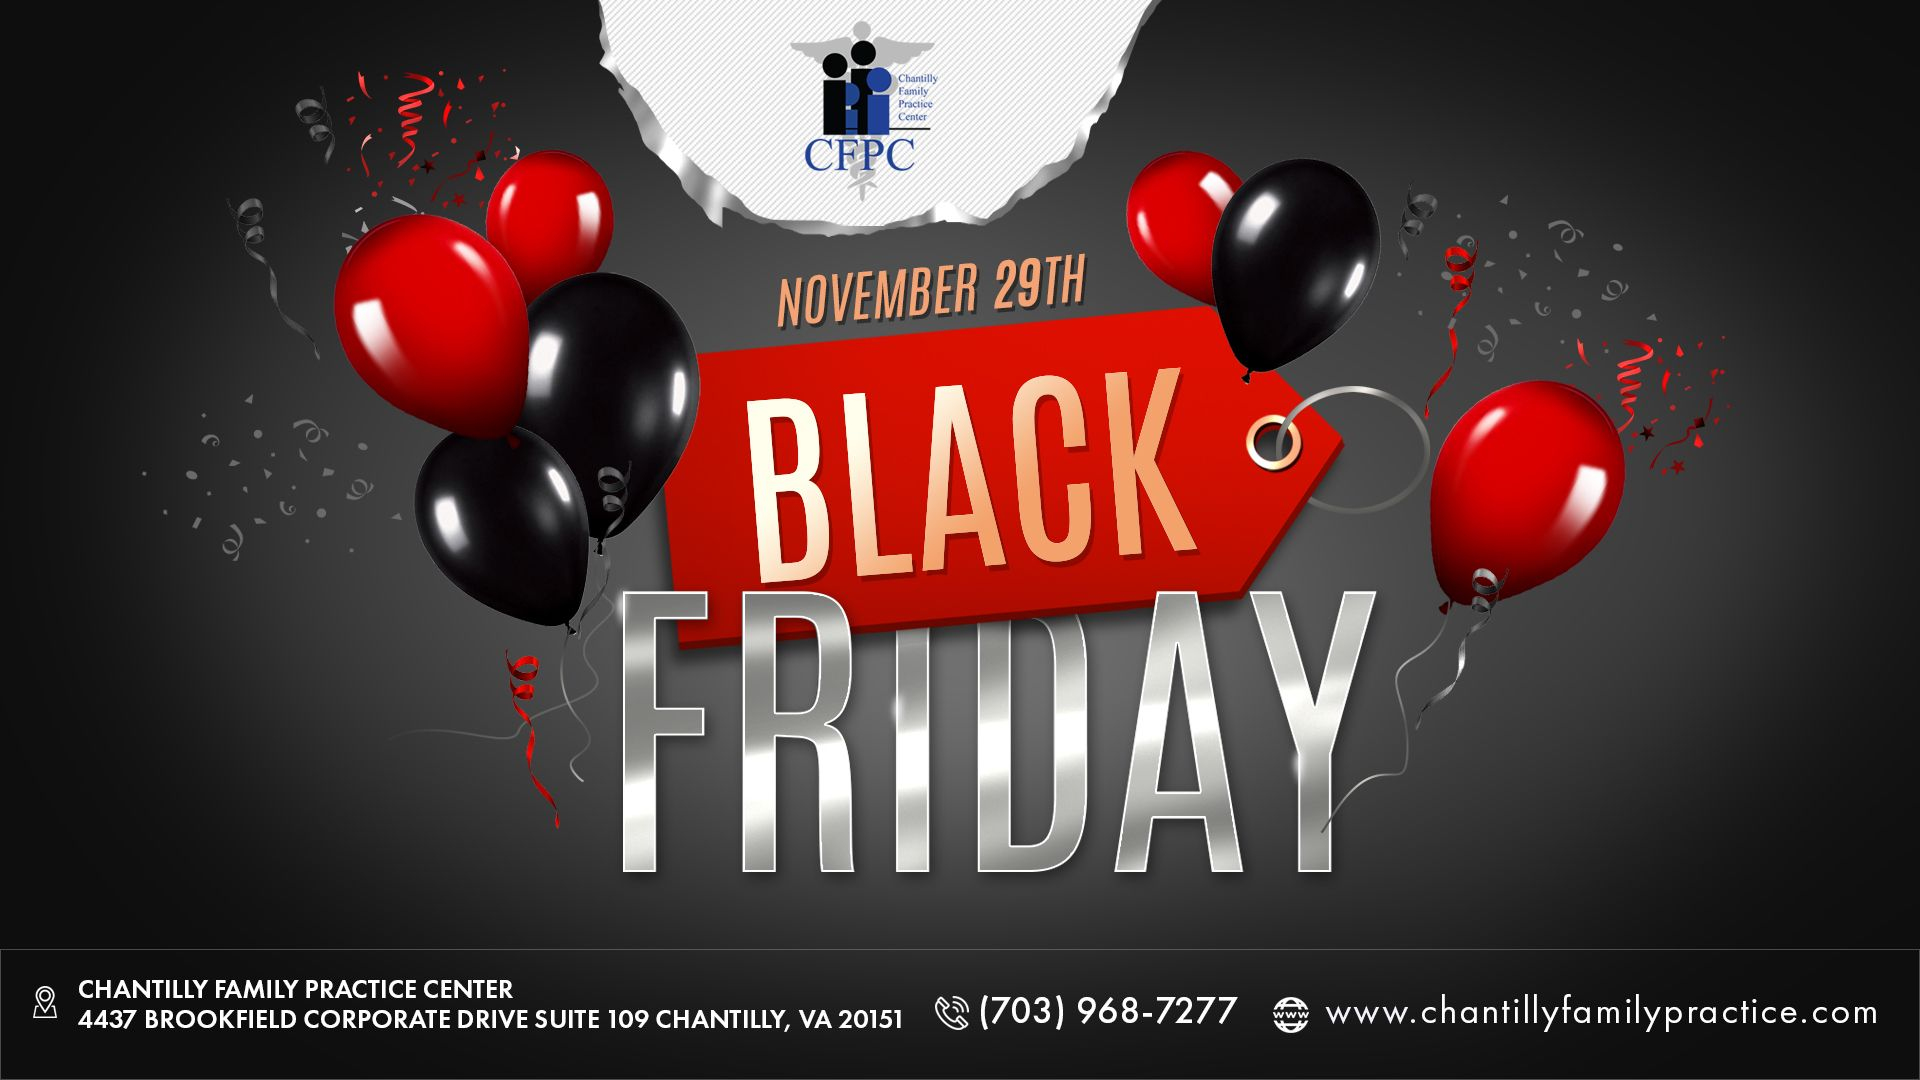 It's BlackFriday! Enjoy the shopping season. Find the